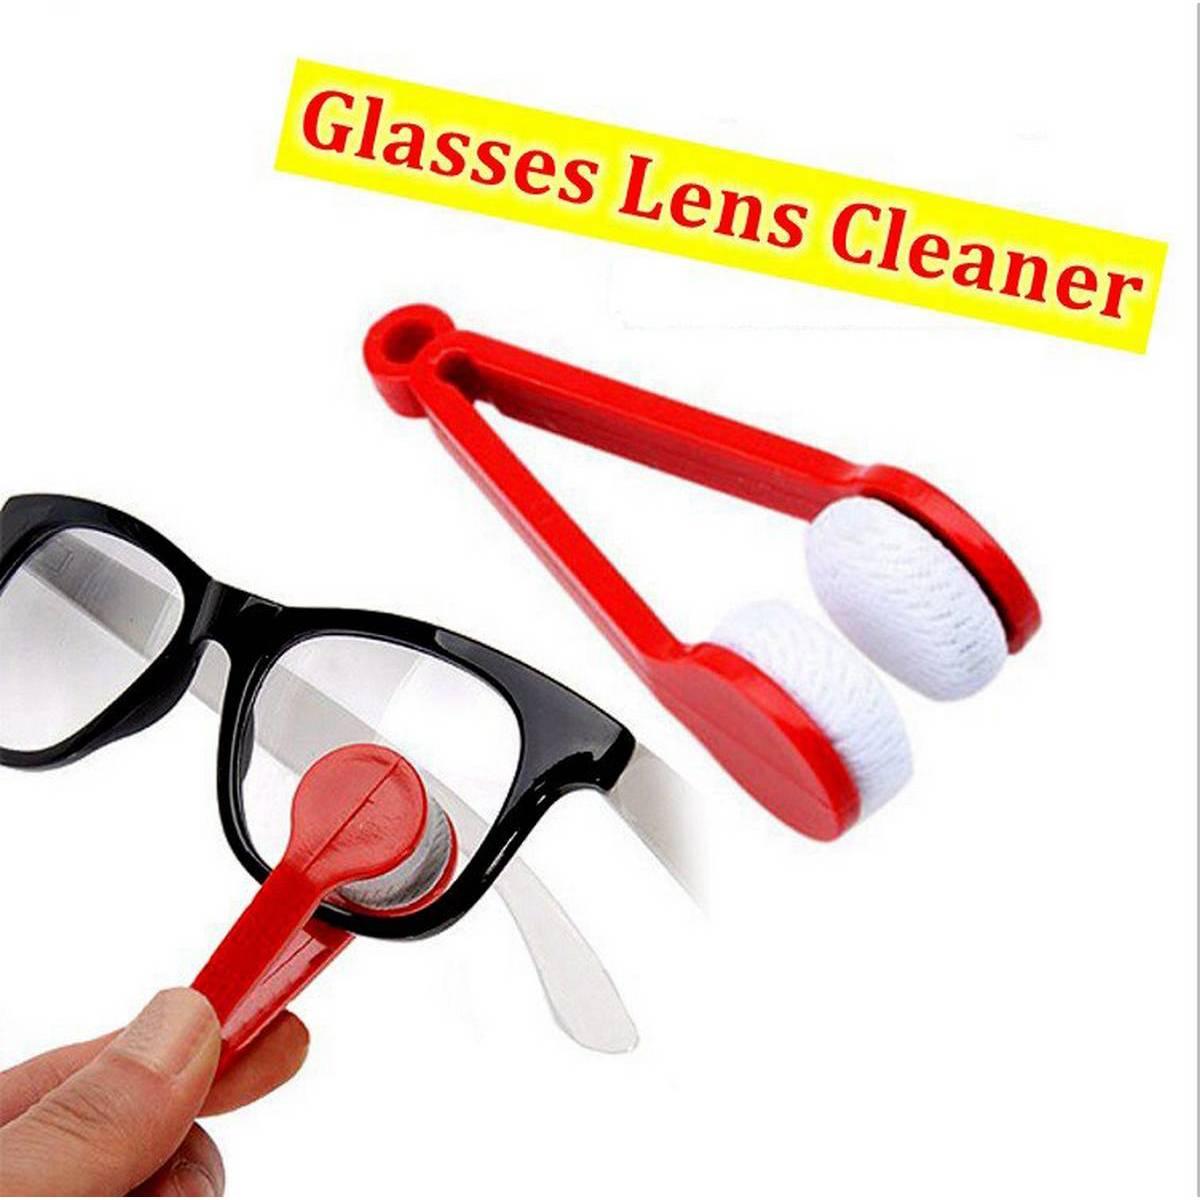 New Mini Eyeglass Cleaning Cloth Multifunctional Portable Super Soft Eyeglass Cleaning Cloth Double-sided Microfiber Eyeglass Brush